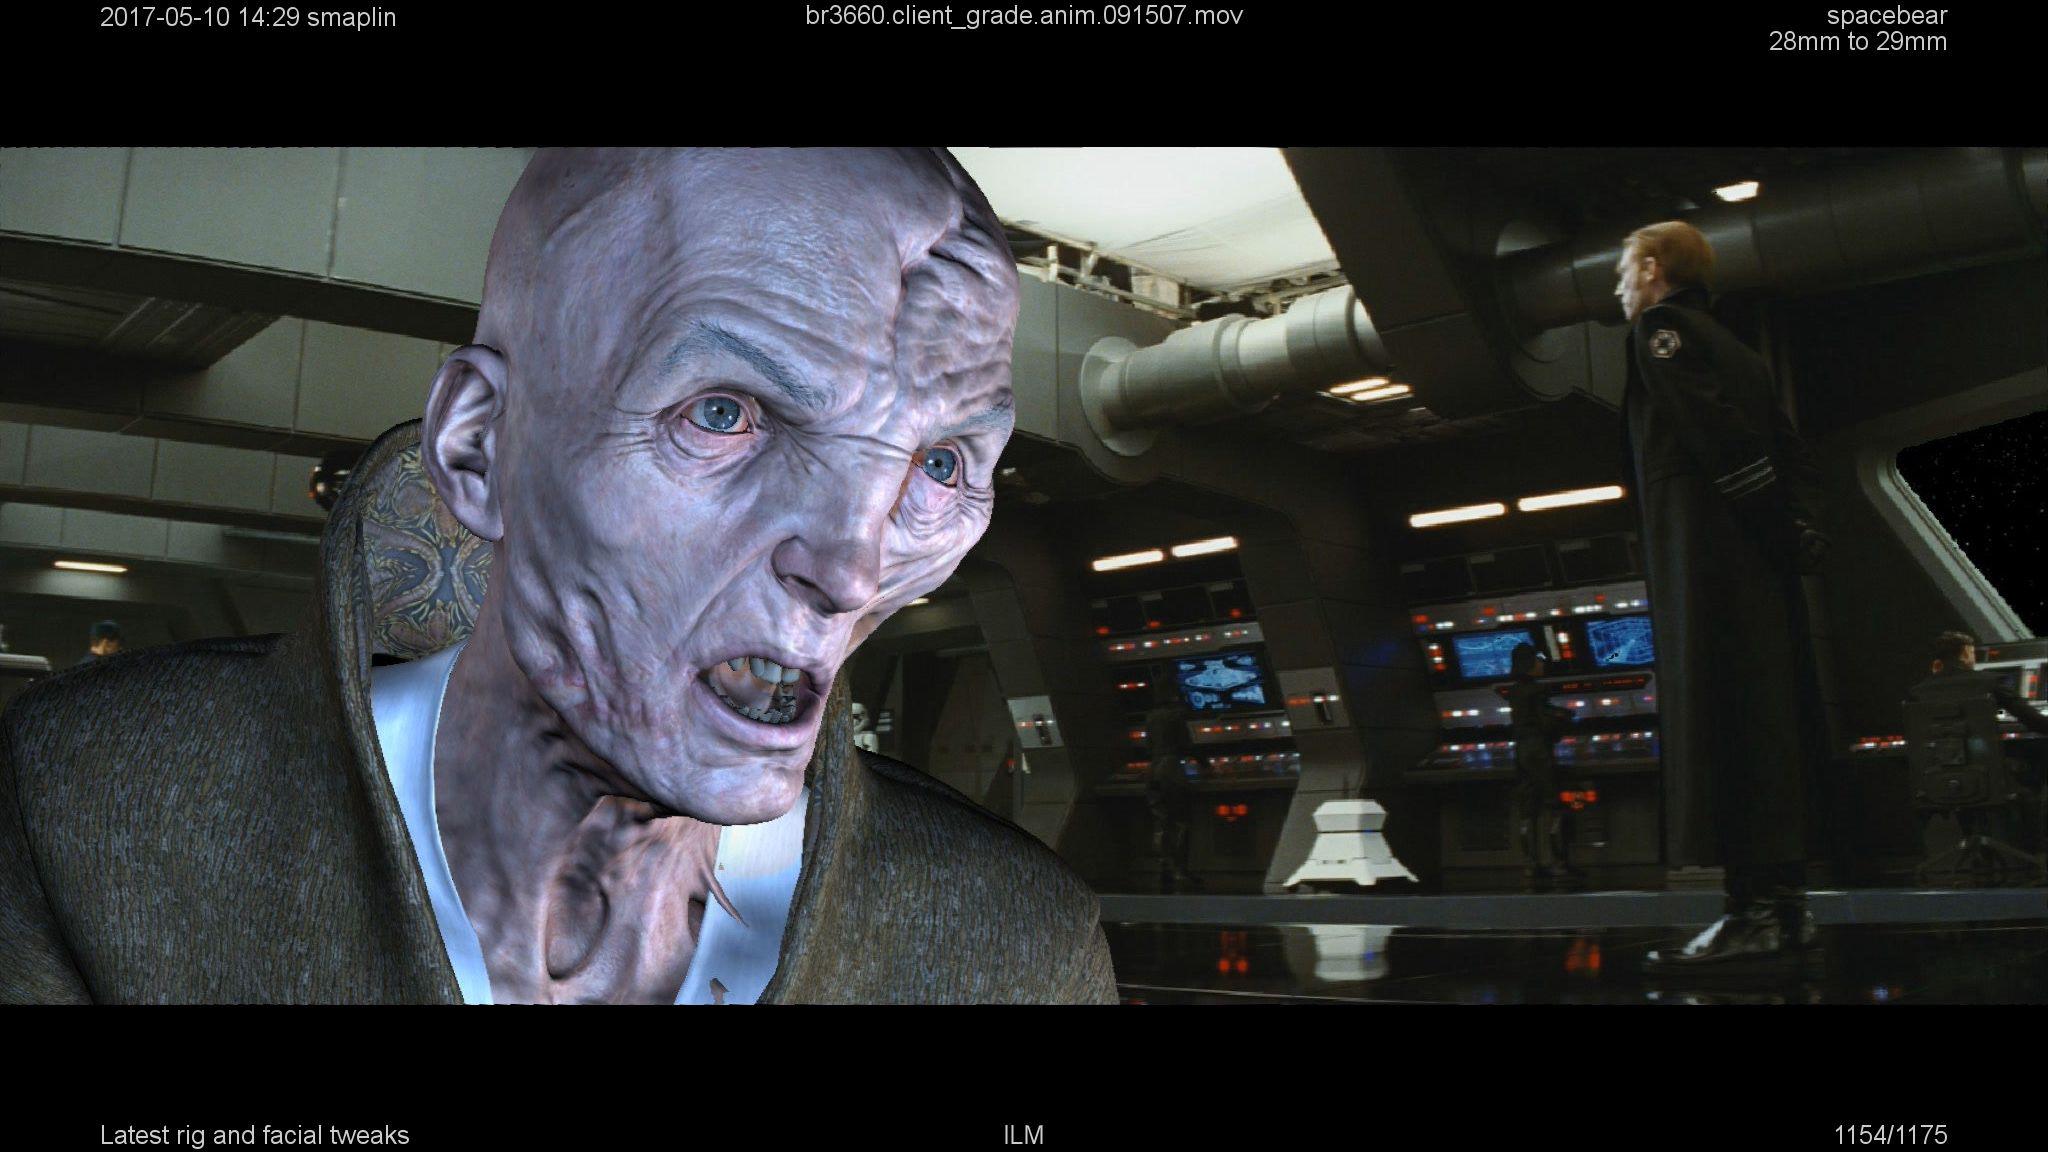 Snoke Deep Dive Into The Latest Ilm Face Tech Fxguide